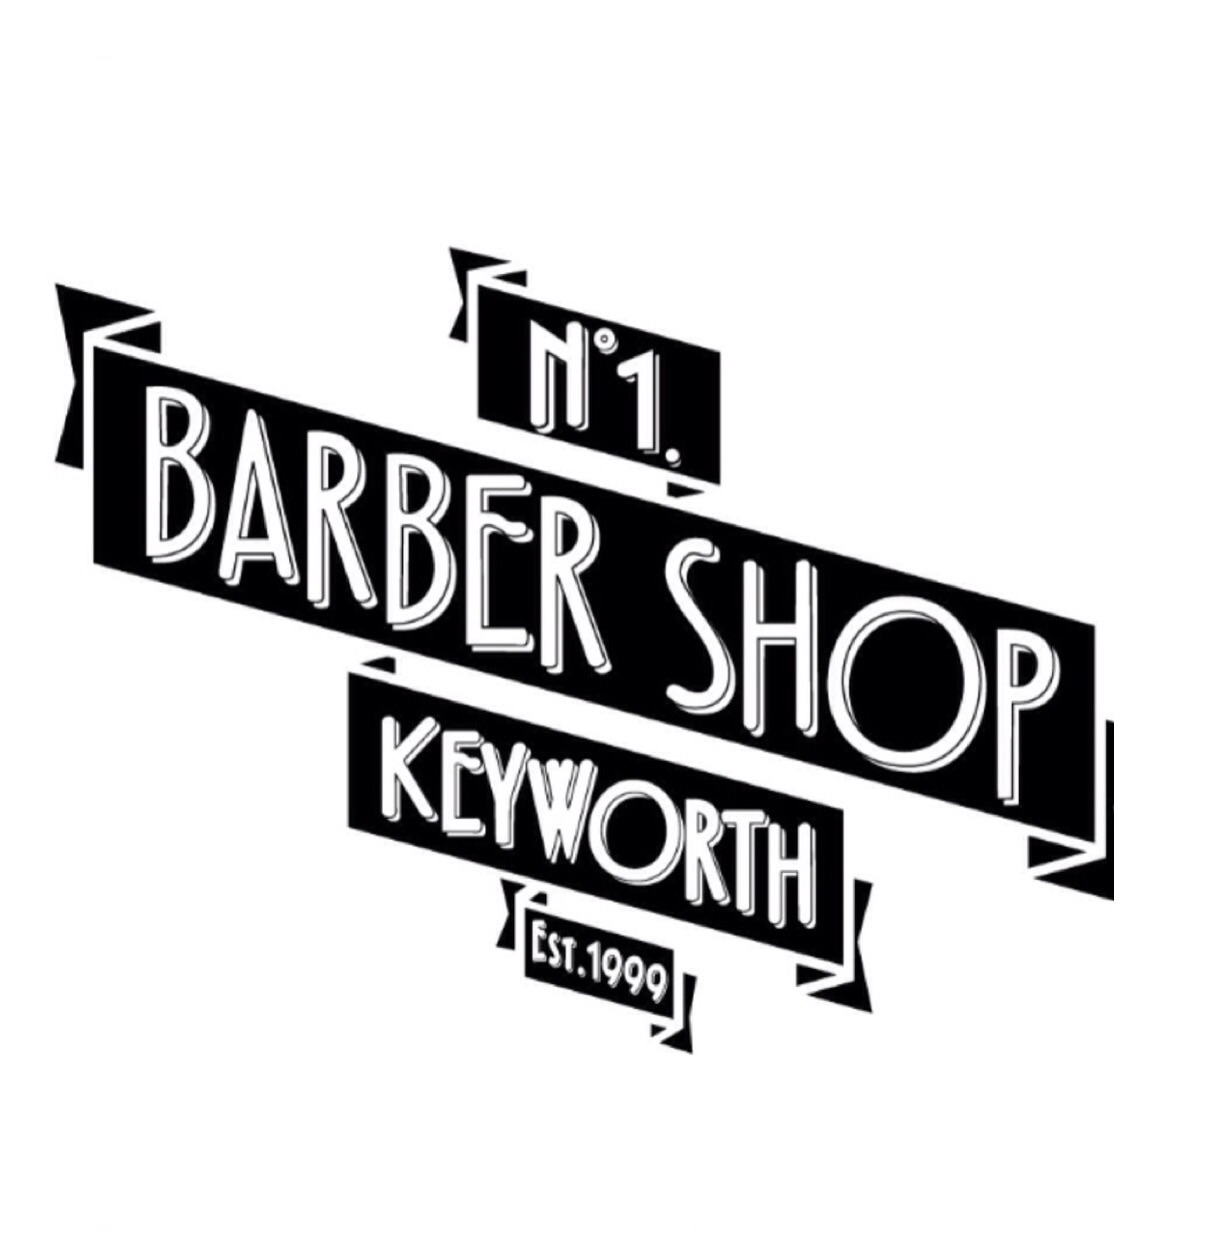 Number One Barbers: Keyworth